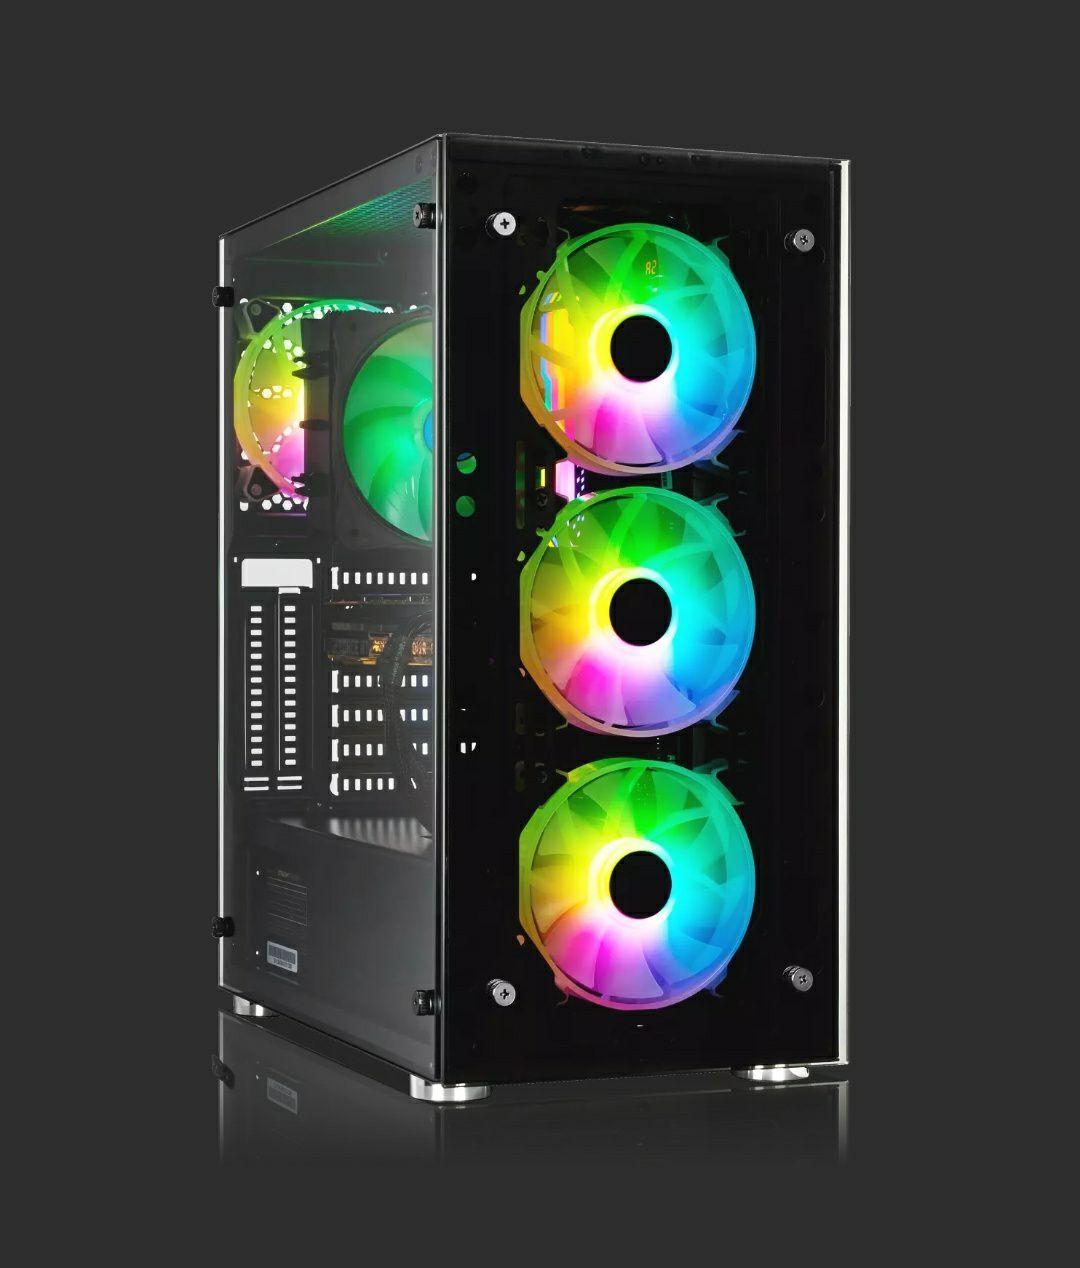 Komplettsystem mit Ryzen 5 3600; Nvidia RTX 3070 - Preis wurde um 80€ erhöht